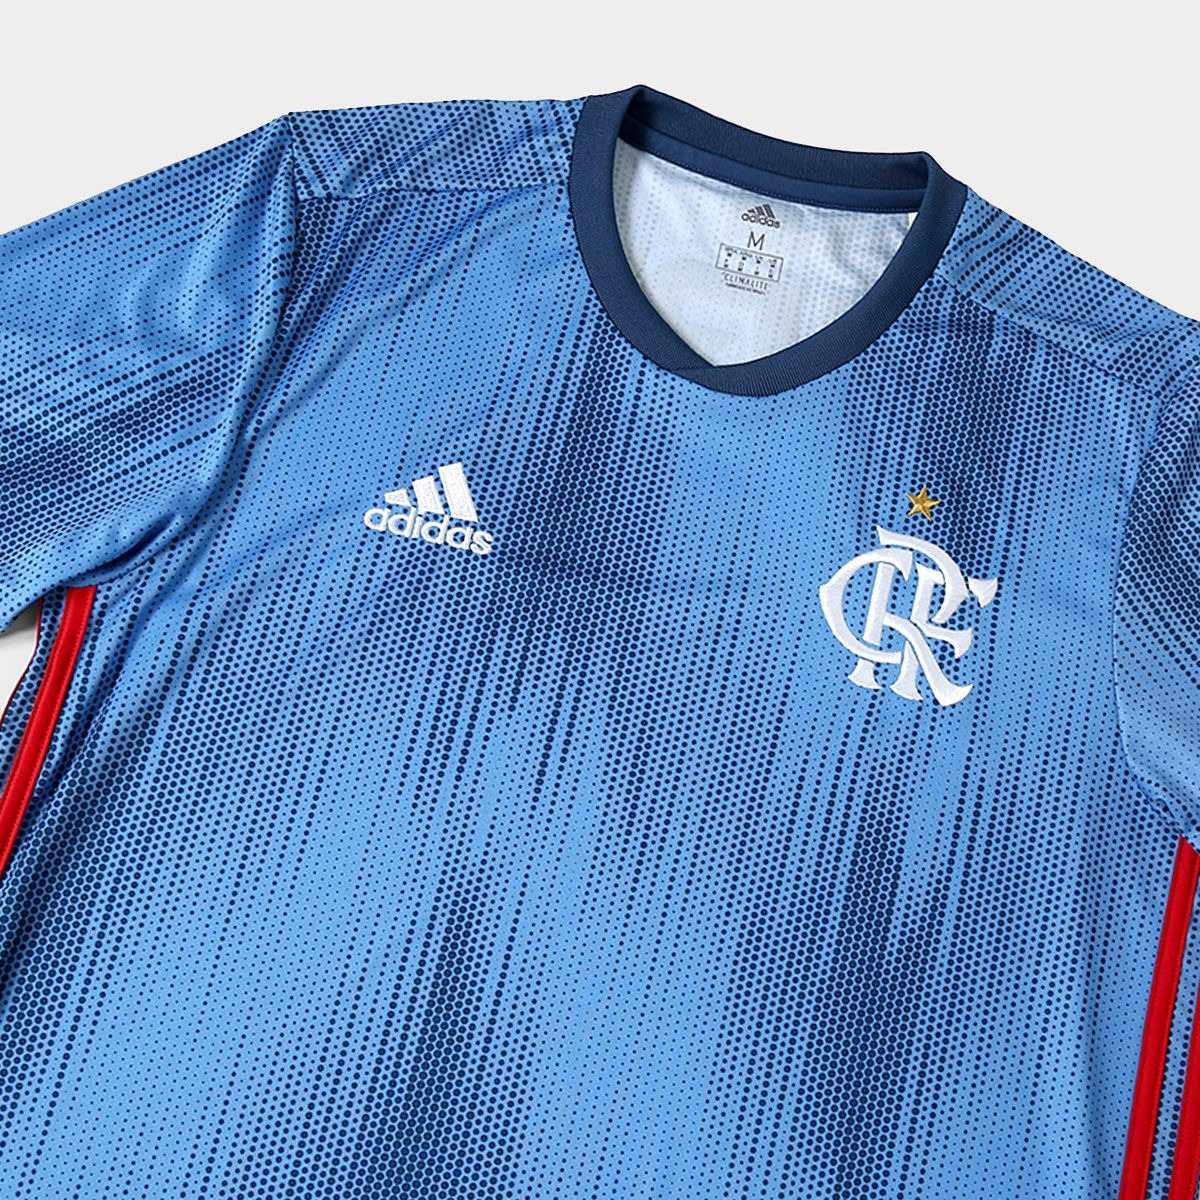 1c1d2abbba ... camisa flamengo iii s n° oficial torcedor adidas masculina. Carregando  zoom.